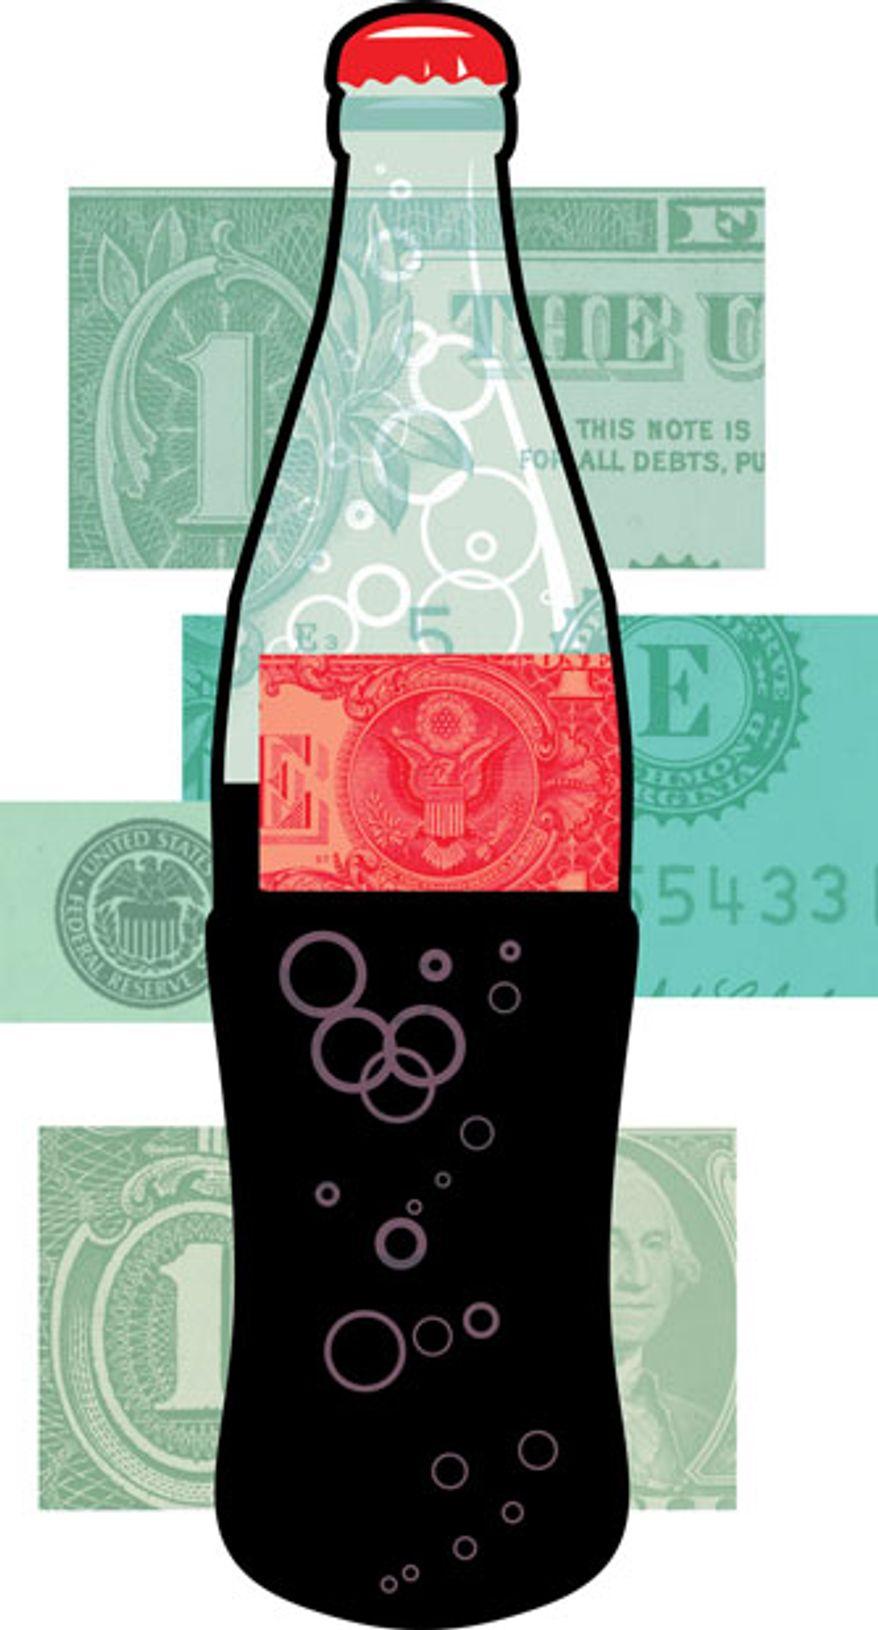 Illustration: Soda tax by Linas Garsys for The Washington Times